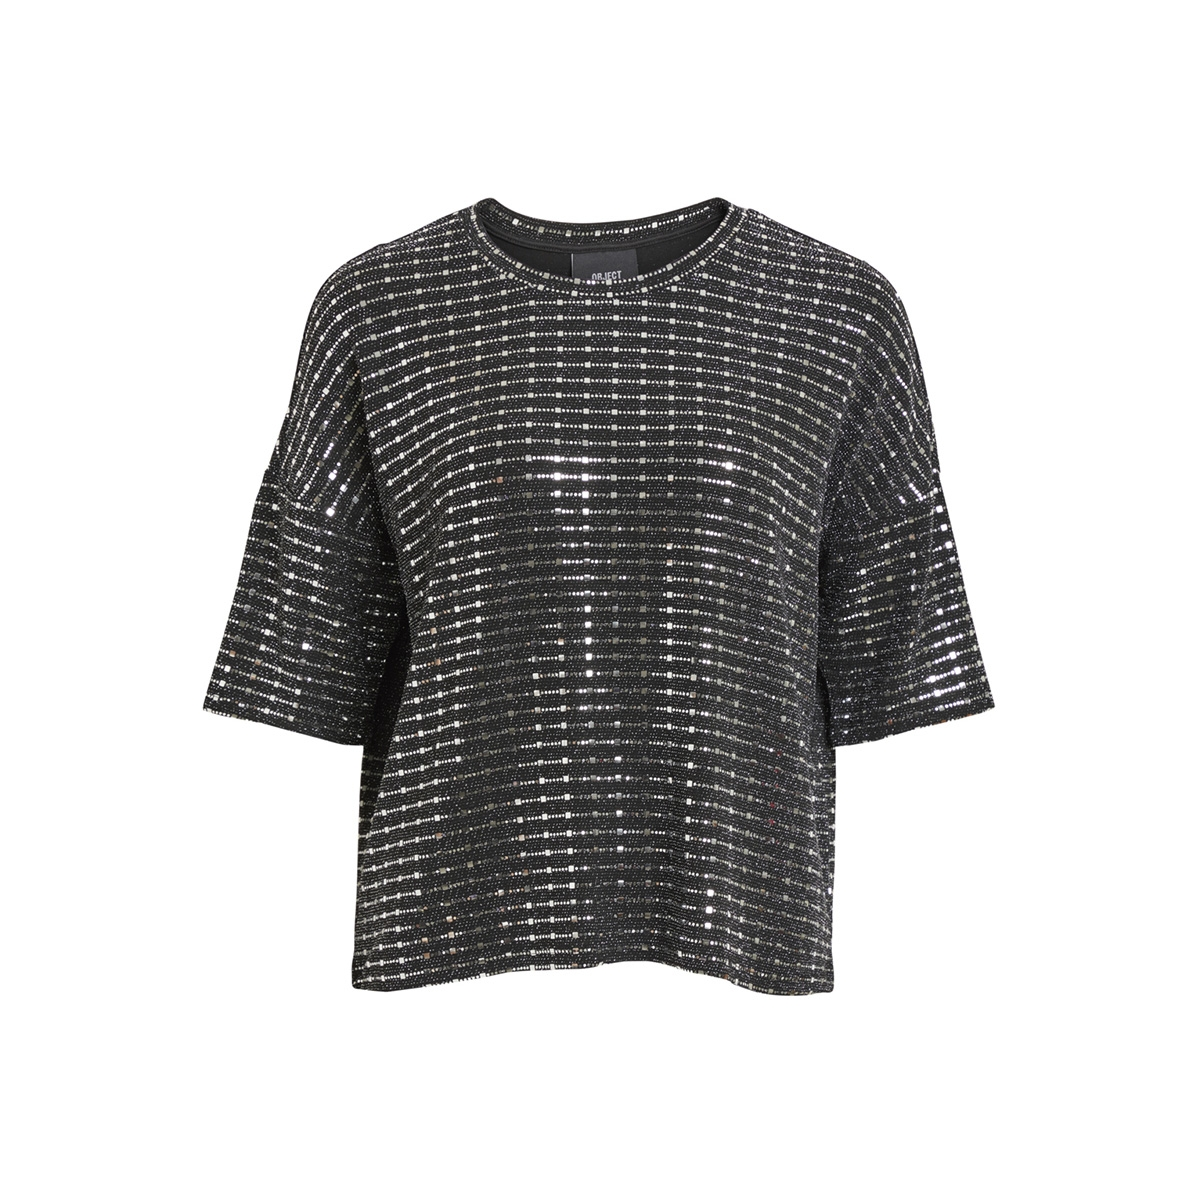 objsharly 2/4 top 100 23028392 object t-shirt black